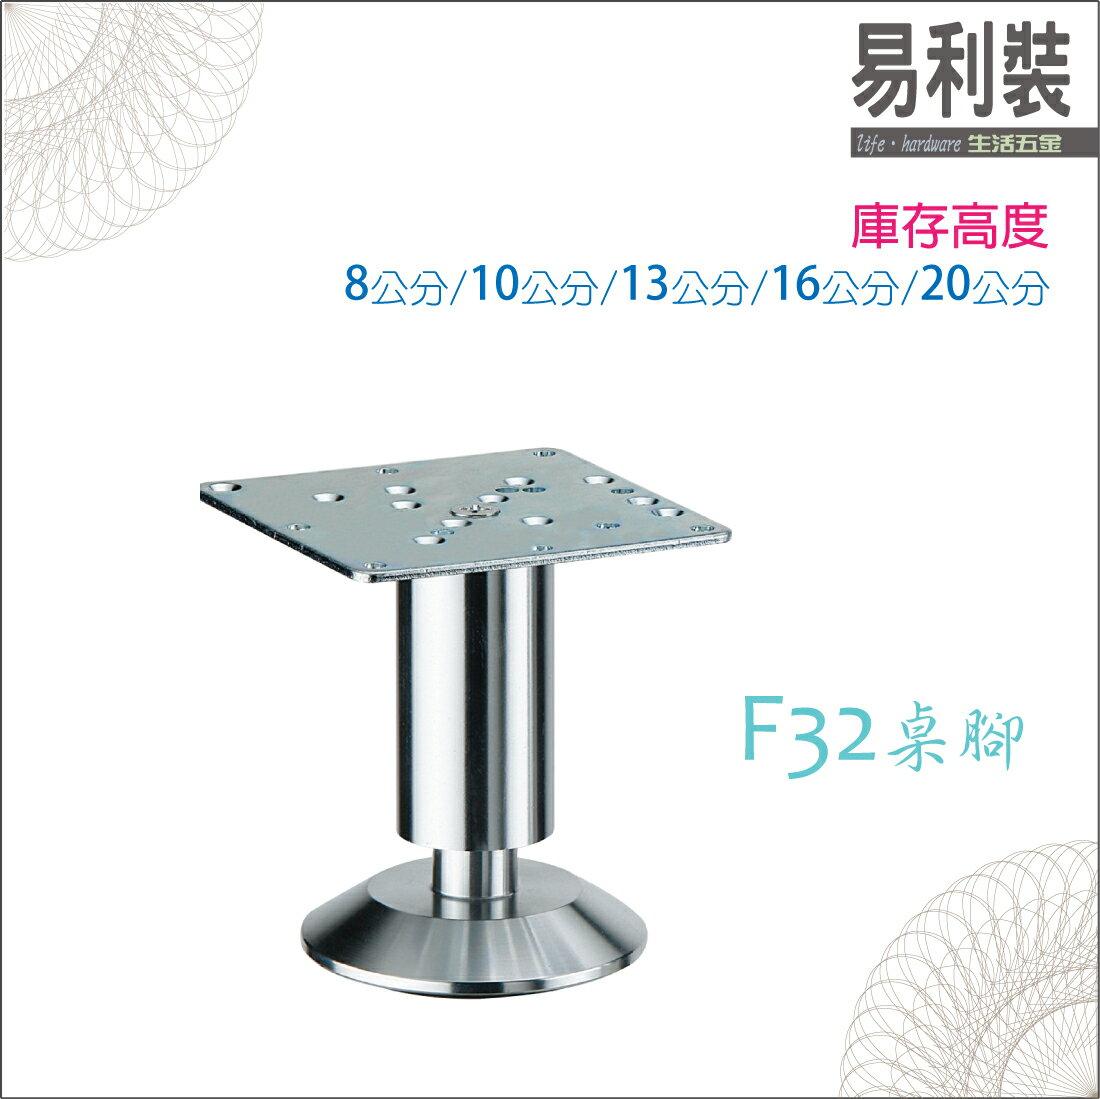 【 EASYCAN 】F32 桌腳 易利裝生活五金 床腳 沙發腳 櫥櫃腳 衣櫃腳 鞋櫃腳 書櫃腳 房間 臥房 衣櫃 小資族 辦公家具 系統家具